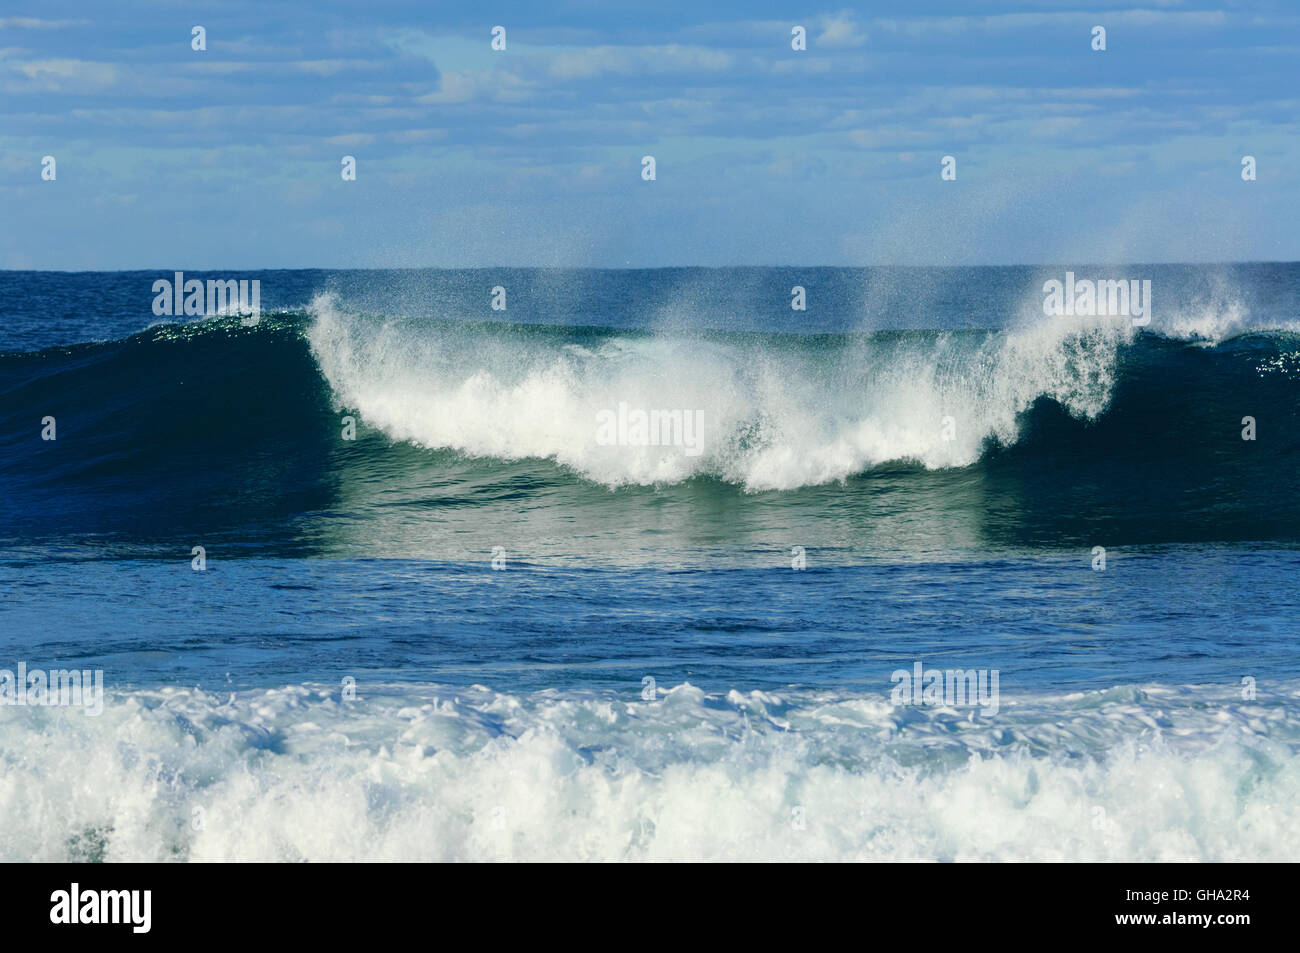 Breaking wave, Gerroa Headland, Illawarra Coast, New South Wales, NSW, Australia - Stock Image